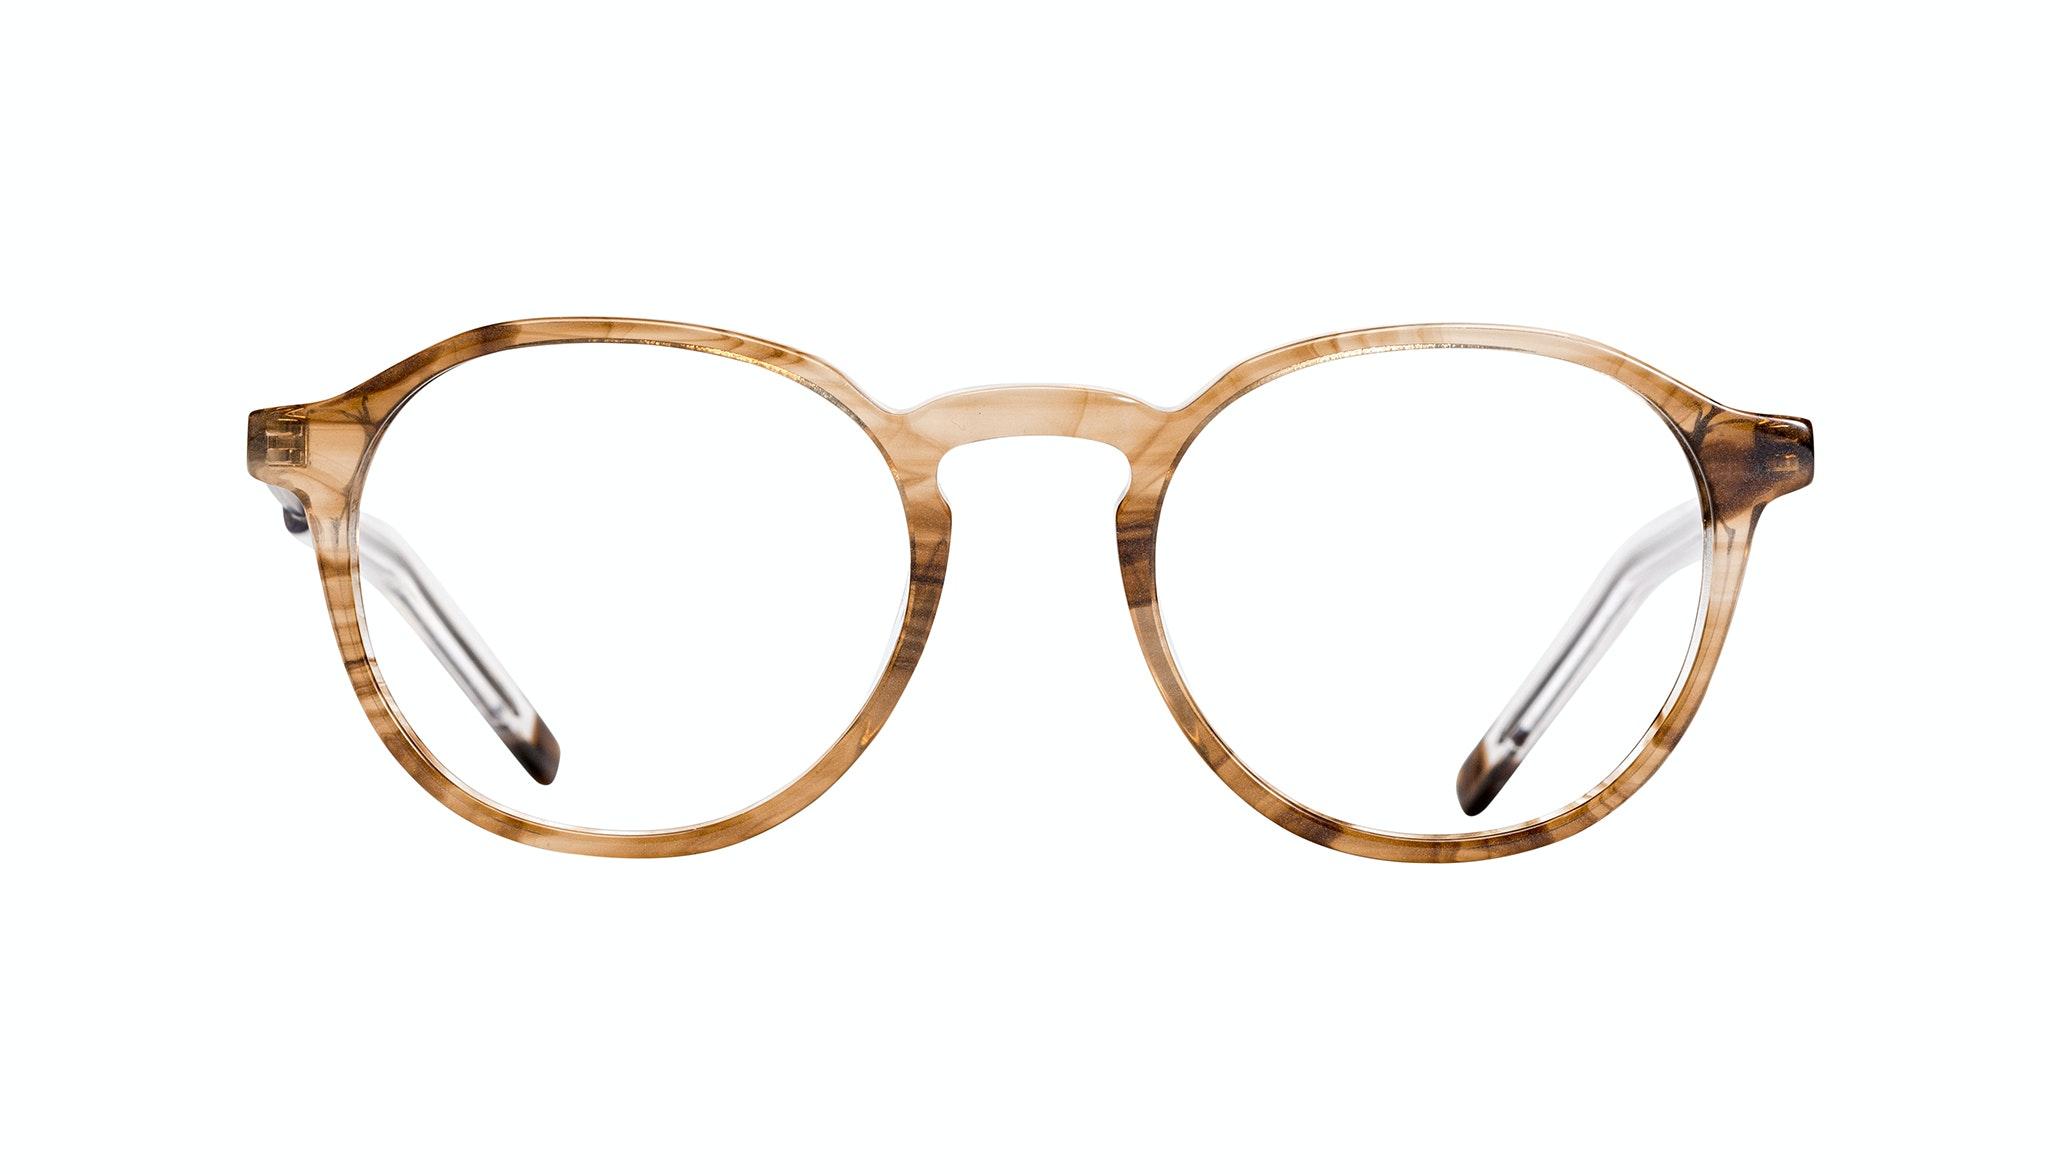 Affordable Fashion Glasses Round Eyeglasses Men Prime Smokey Havana Front